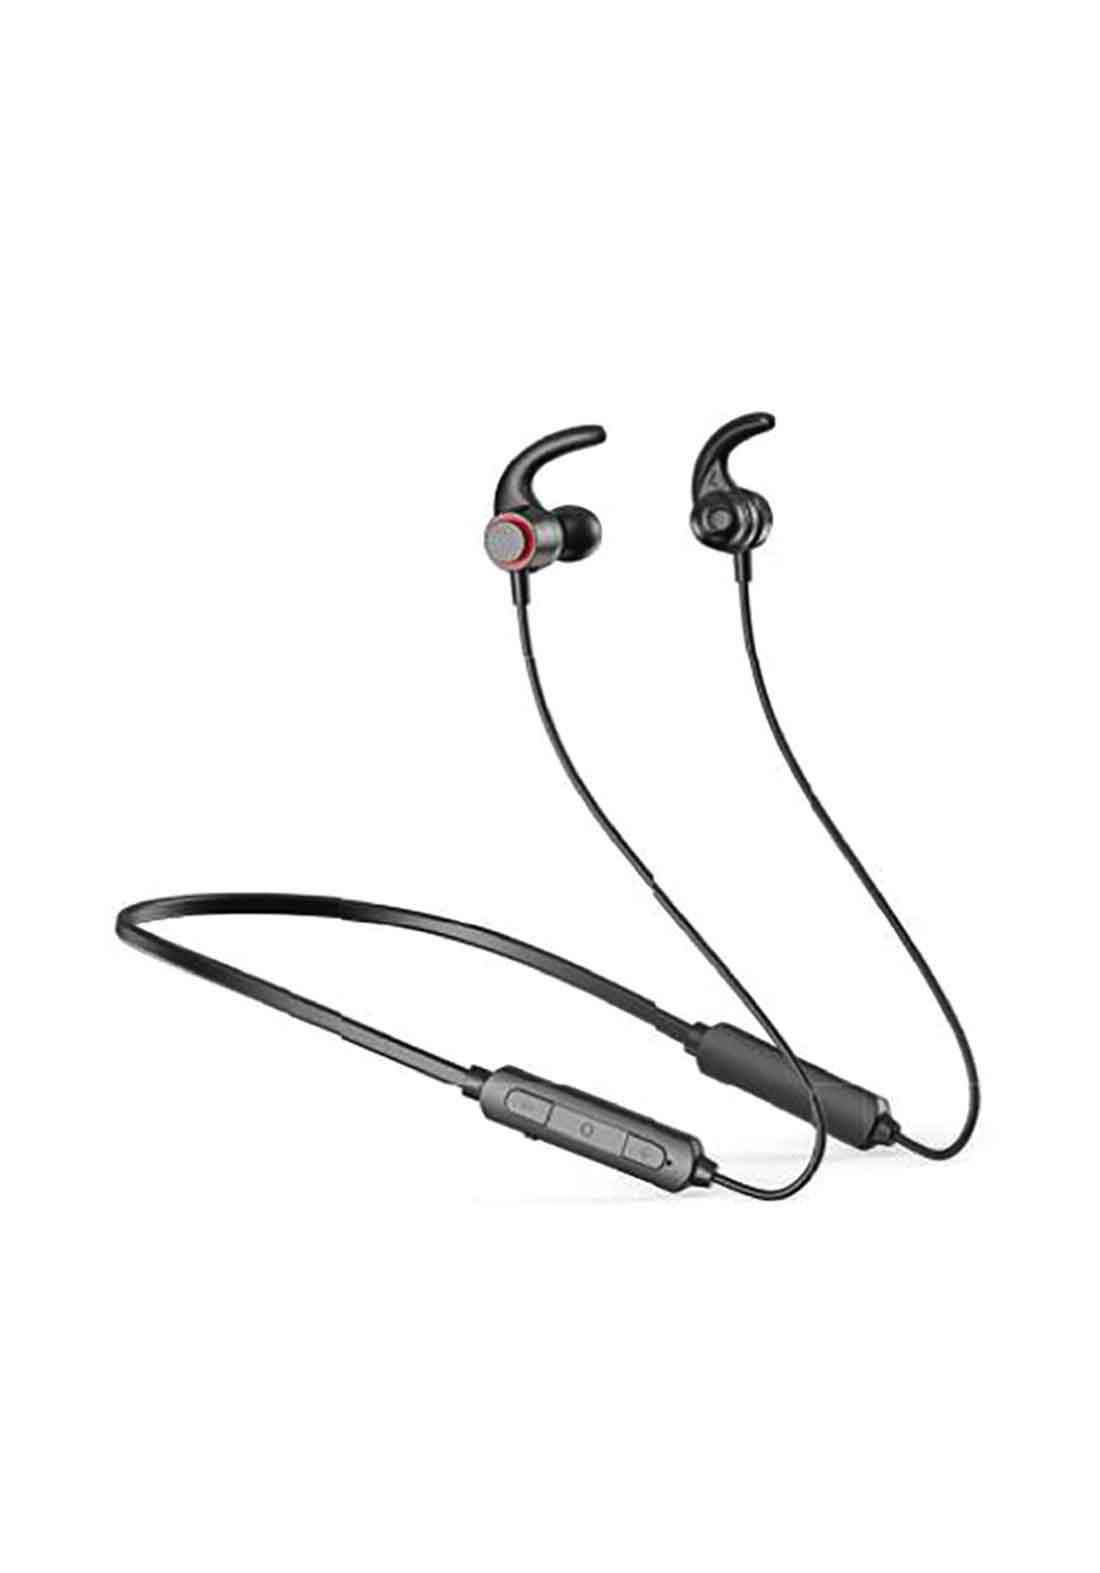 Havit E514BT Neckband Bluetooth Earphone - Black سماعة